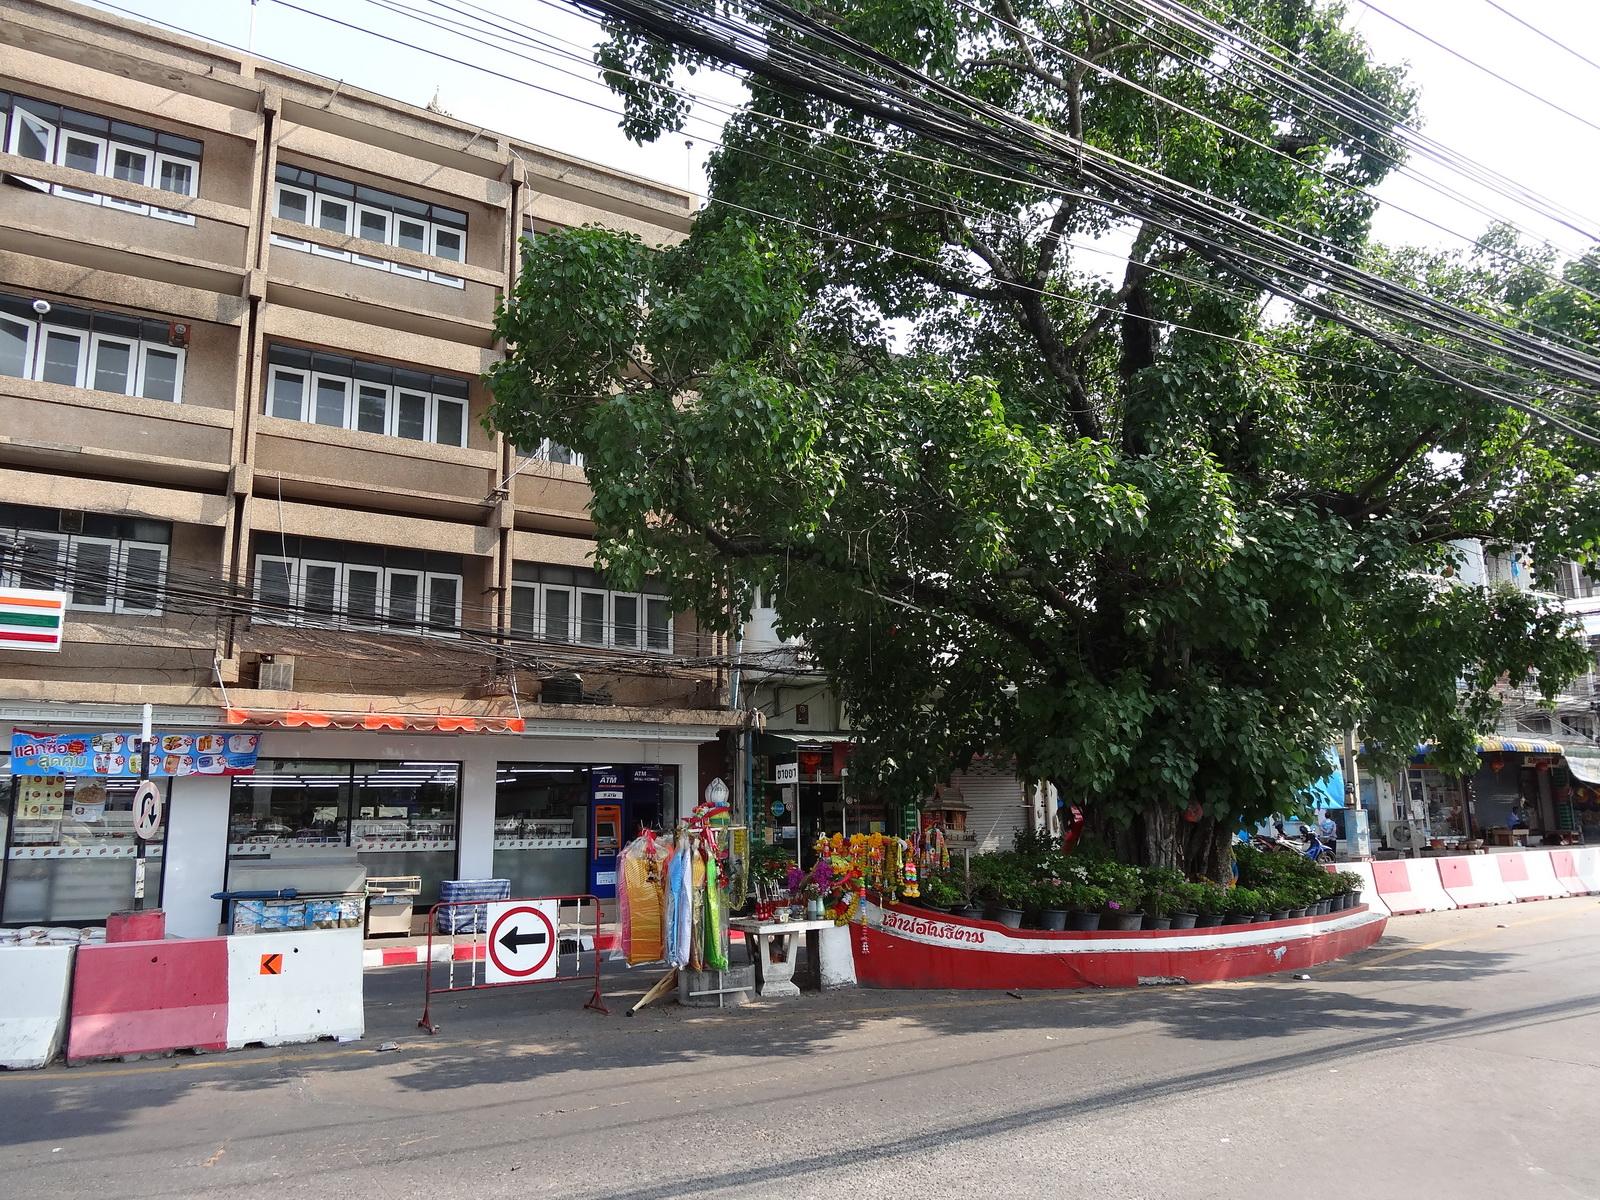 01 Pattaya 009